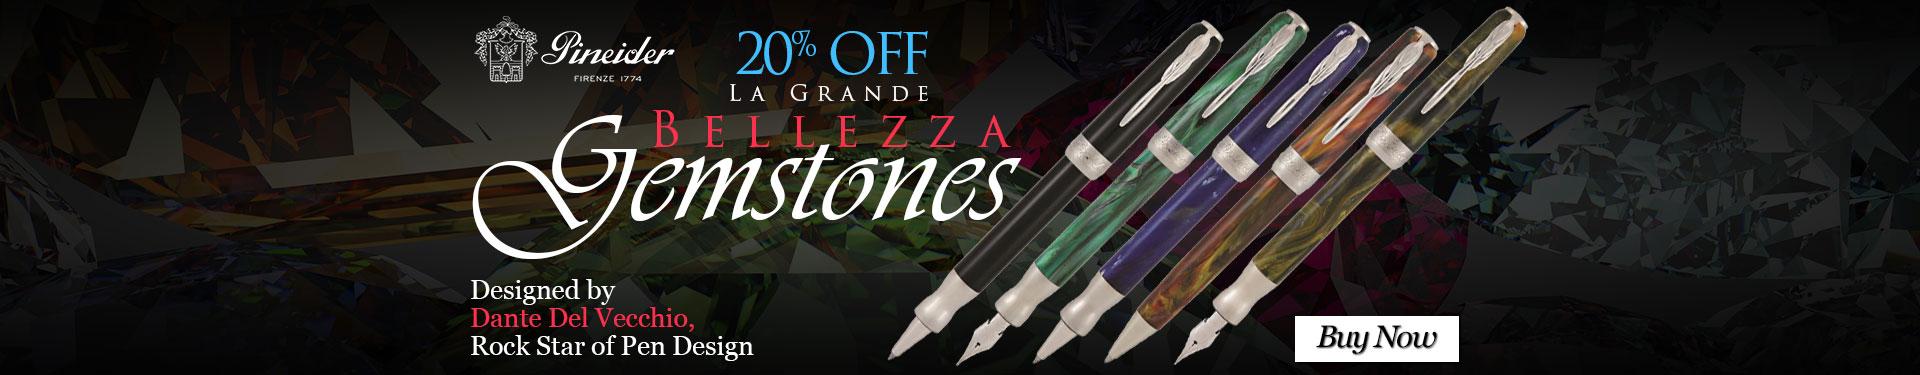 Pineider La Grande Bellezza Gemstones 20% Off